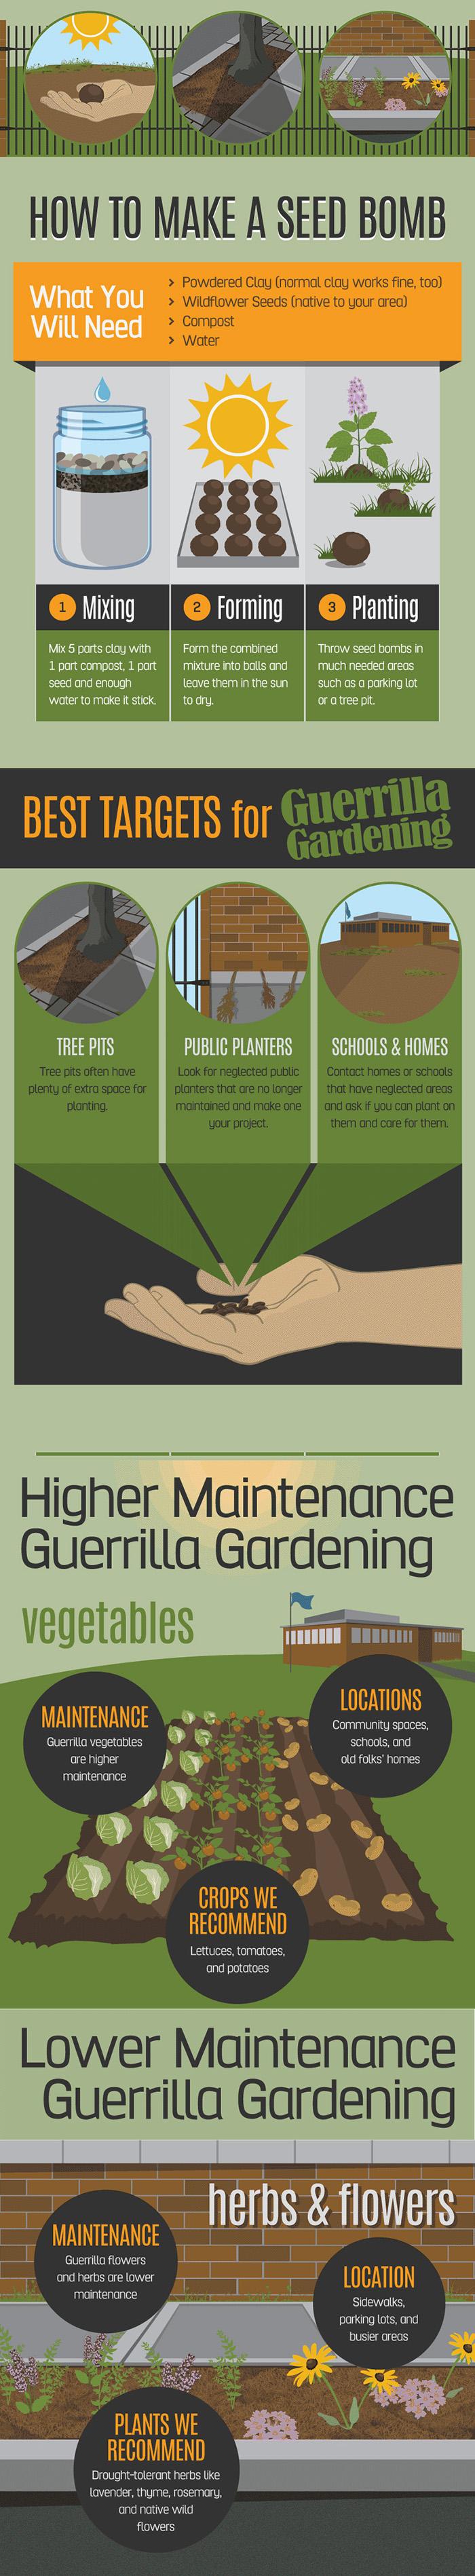 Guerrilla-gardening-infographic-2